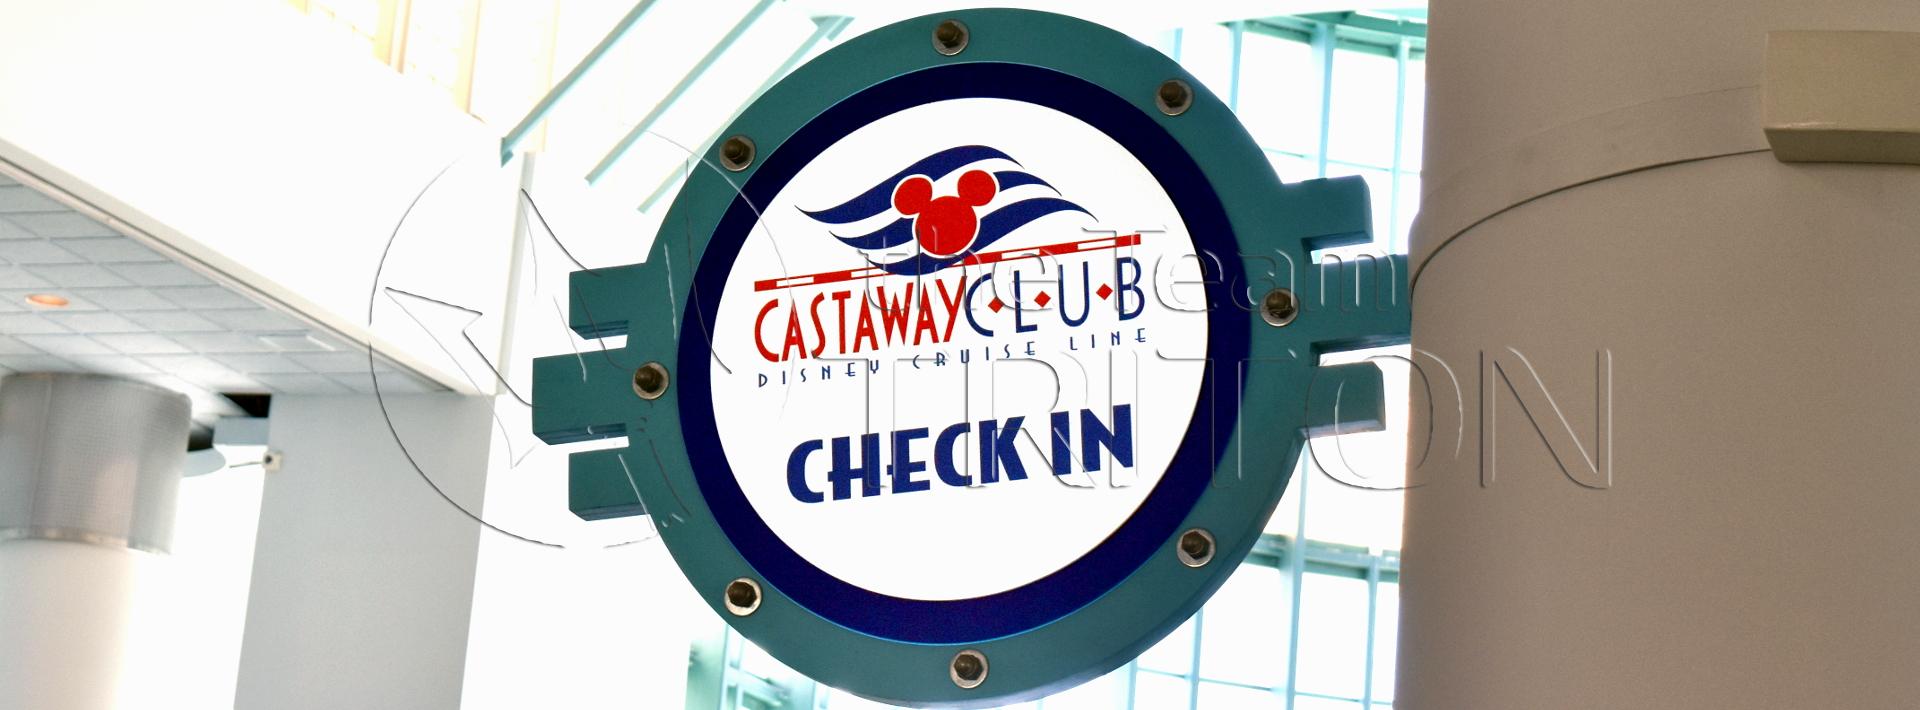 DCL-port-canaveral-castaway-club-sign-001